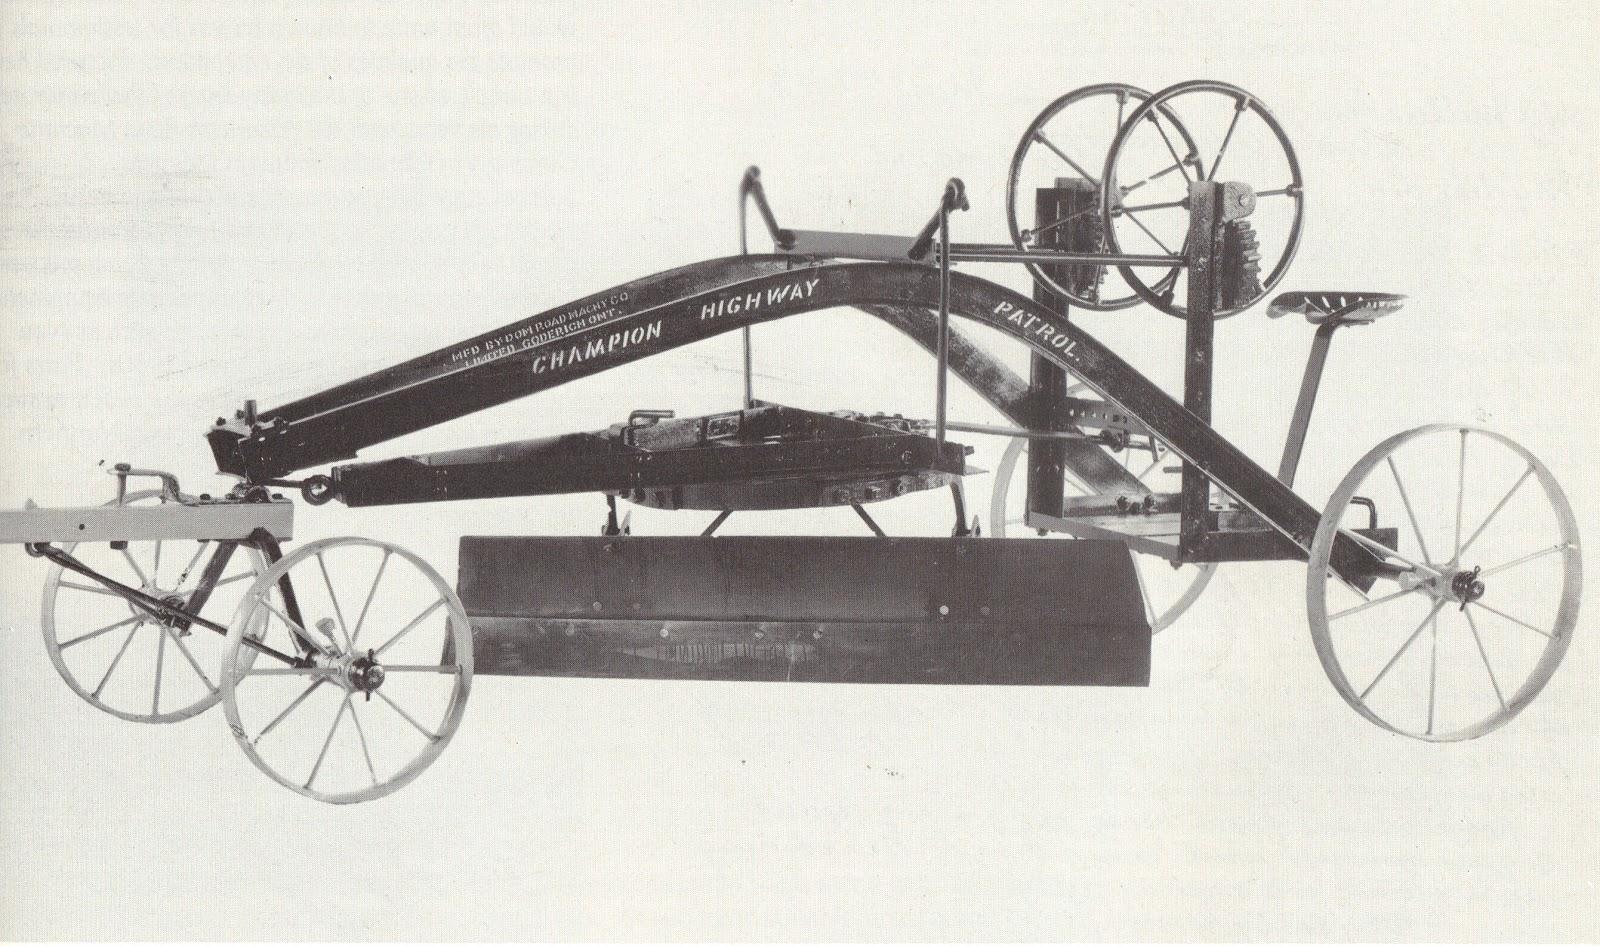 champion road machinery